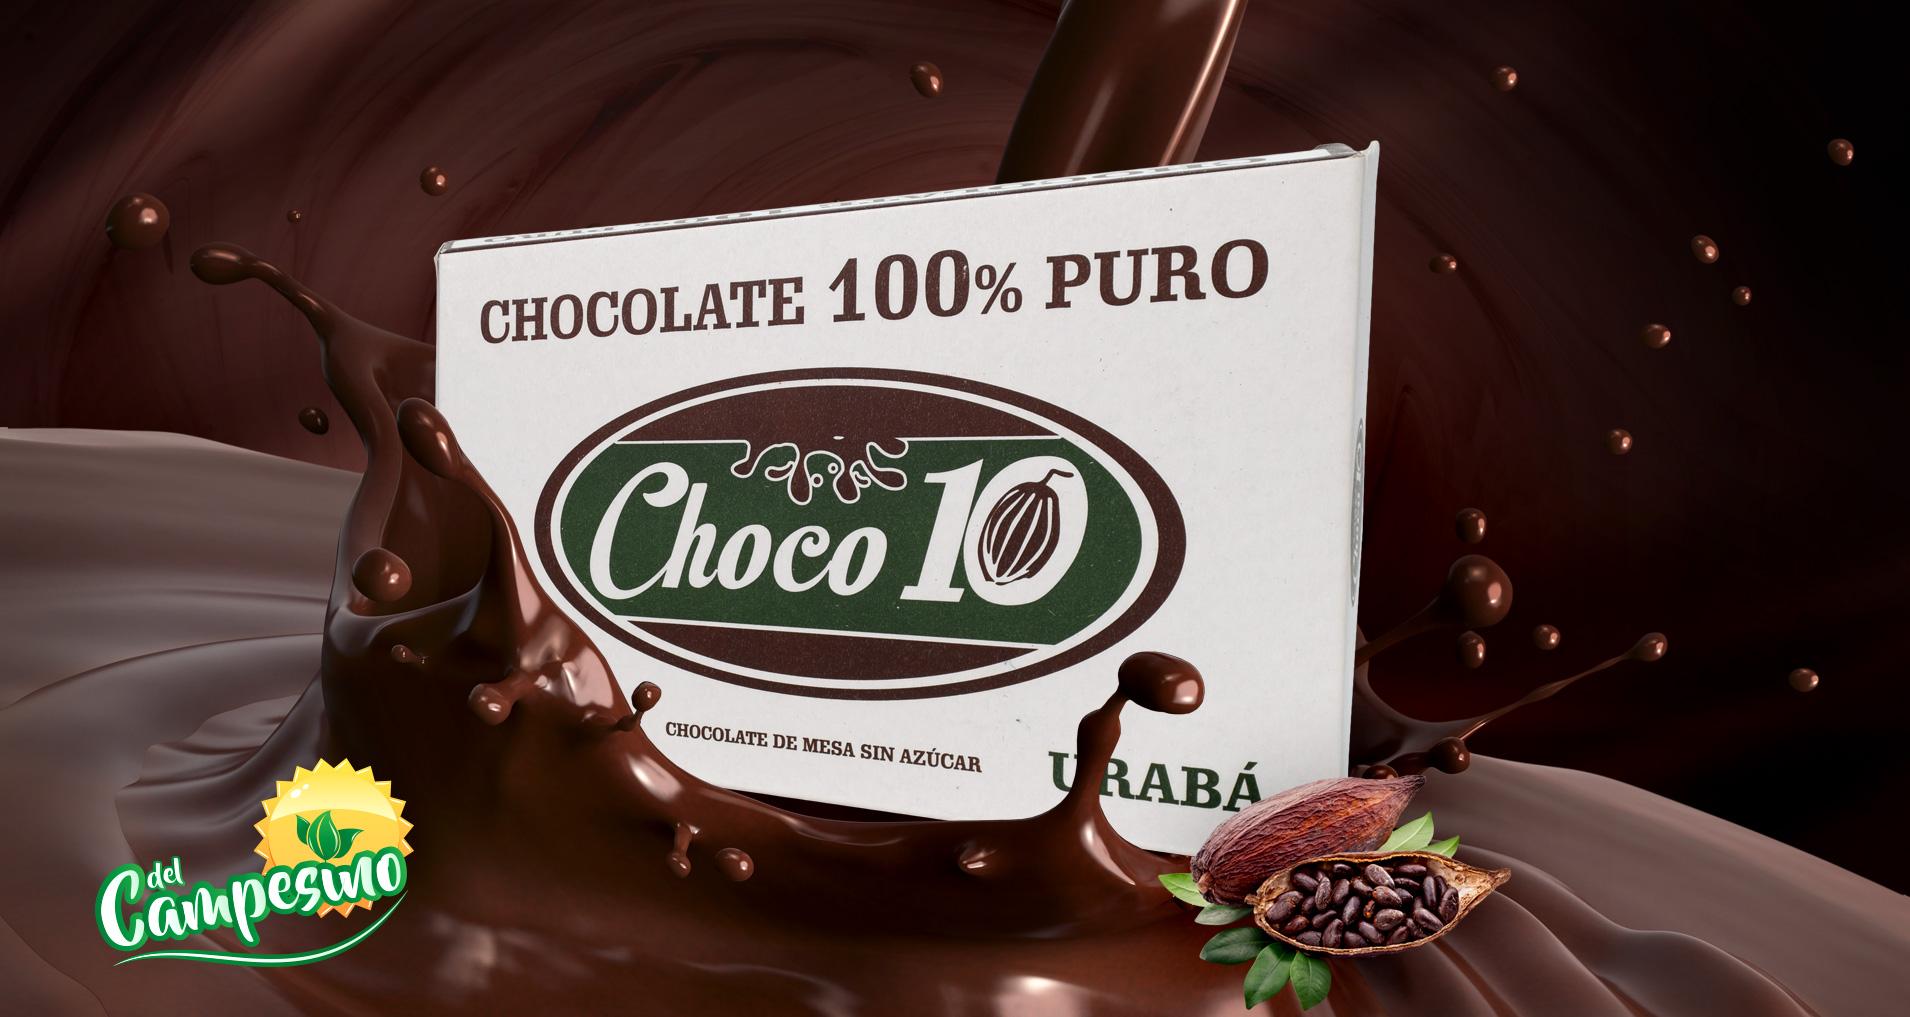 Choco10PuroSlider